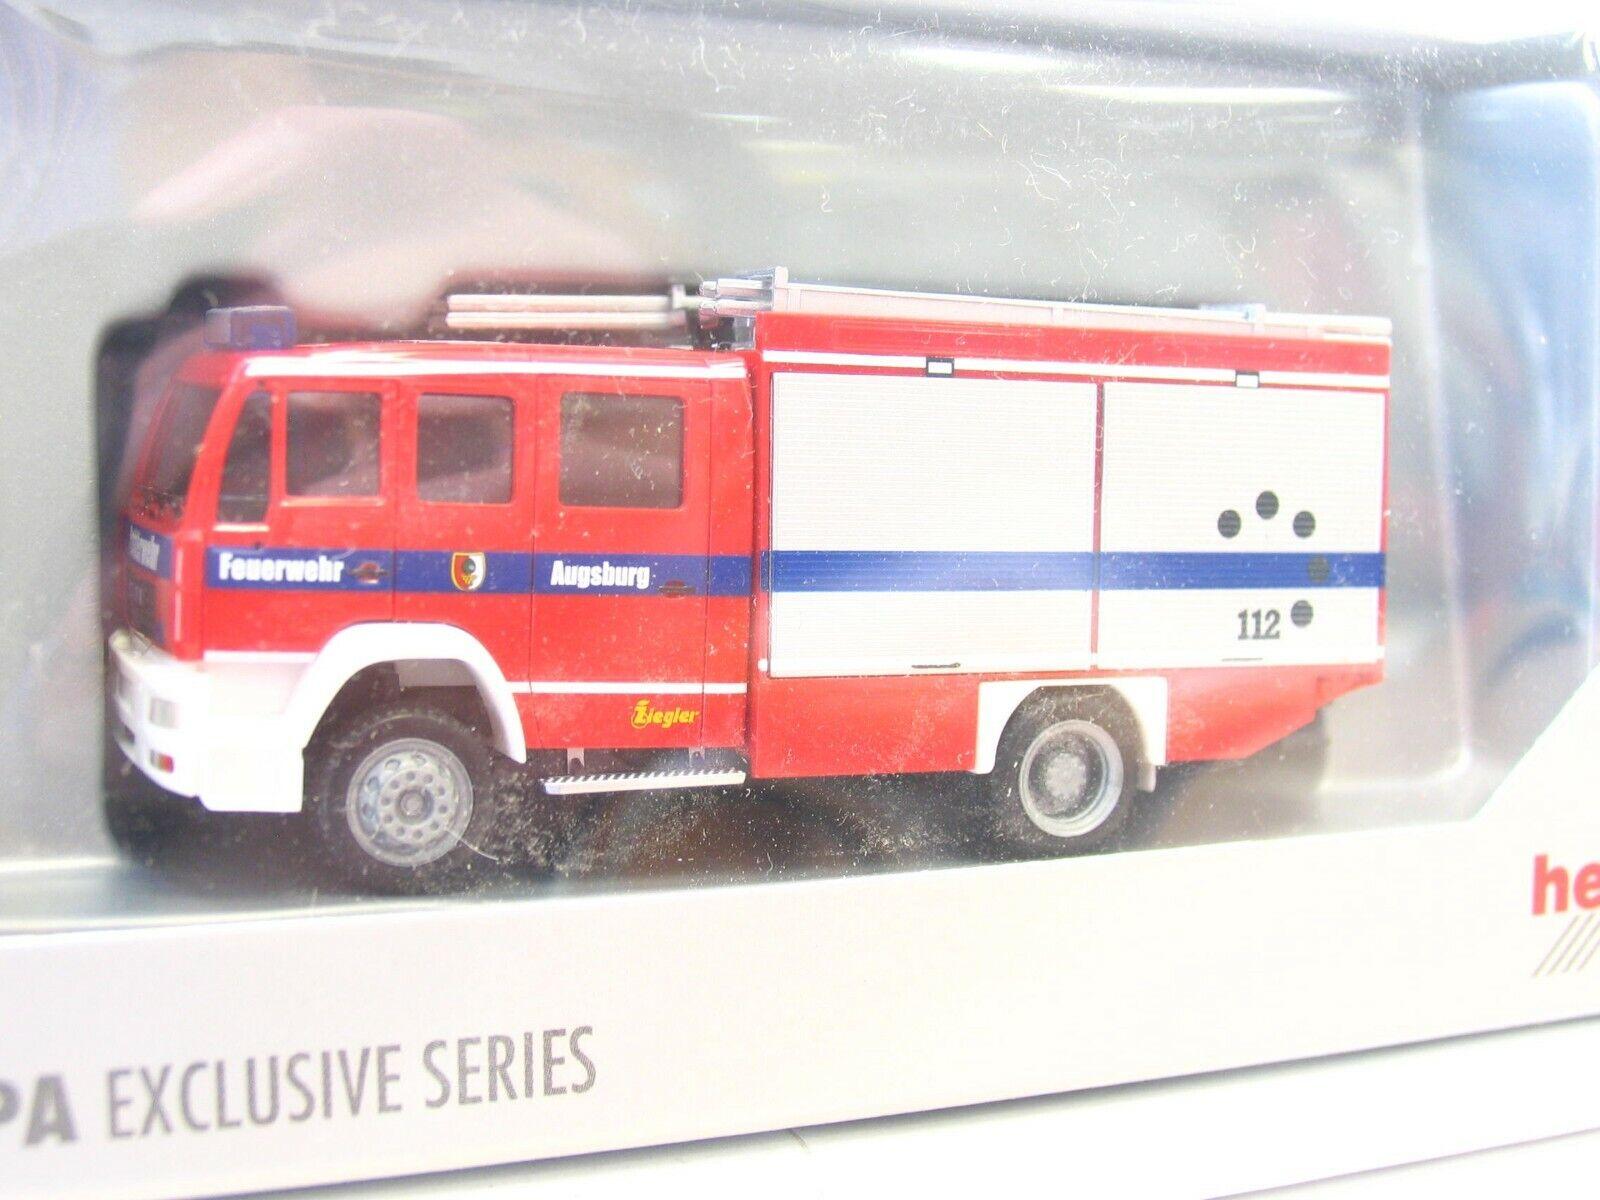 HERPA 1 87 man le2000 LF 16 12 pompiers Augsbourg neuf dans sa boîte (ln2700)